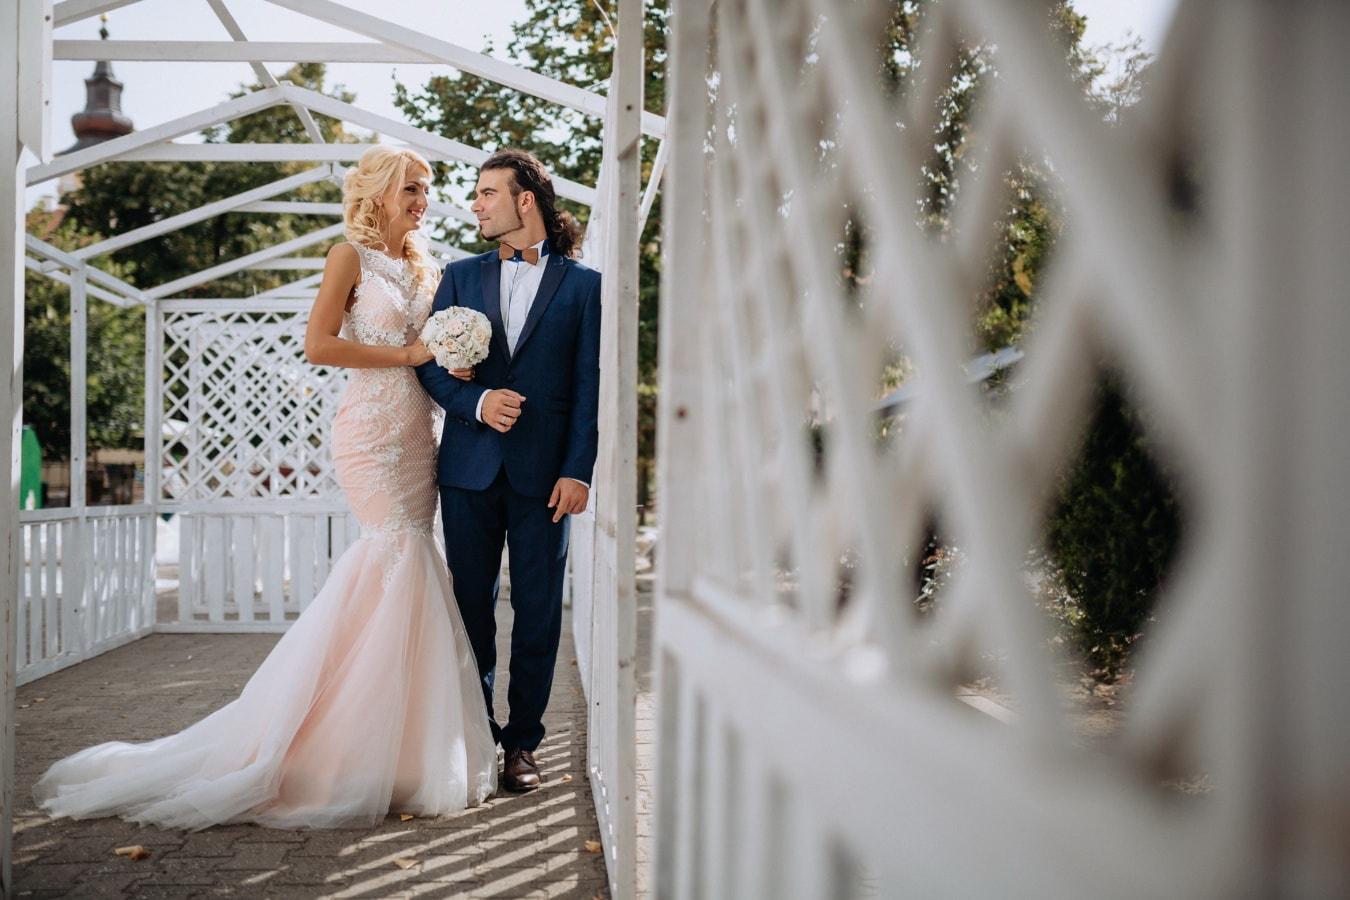 newlyweds, wedding venue, bride, outdoors, glamour, wedding, marriage, engagement, love, girl